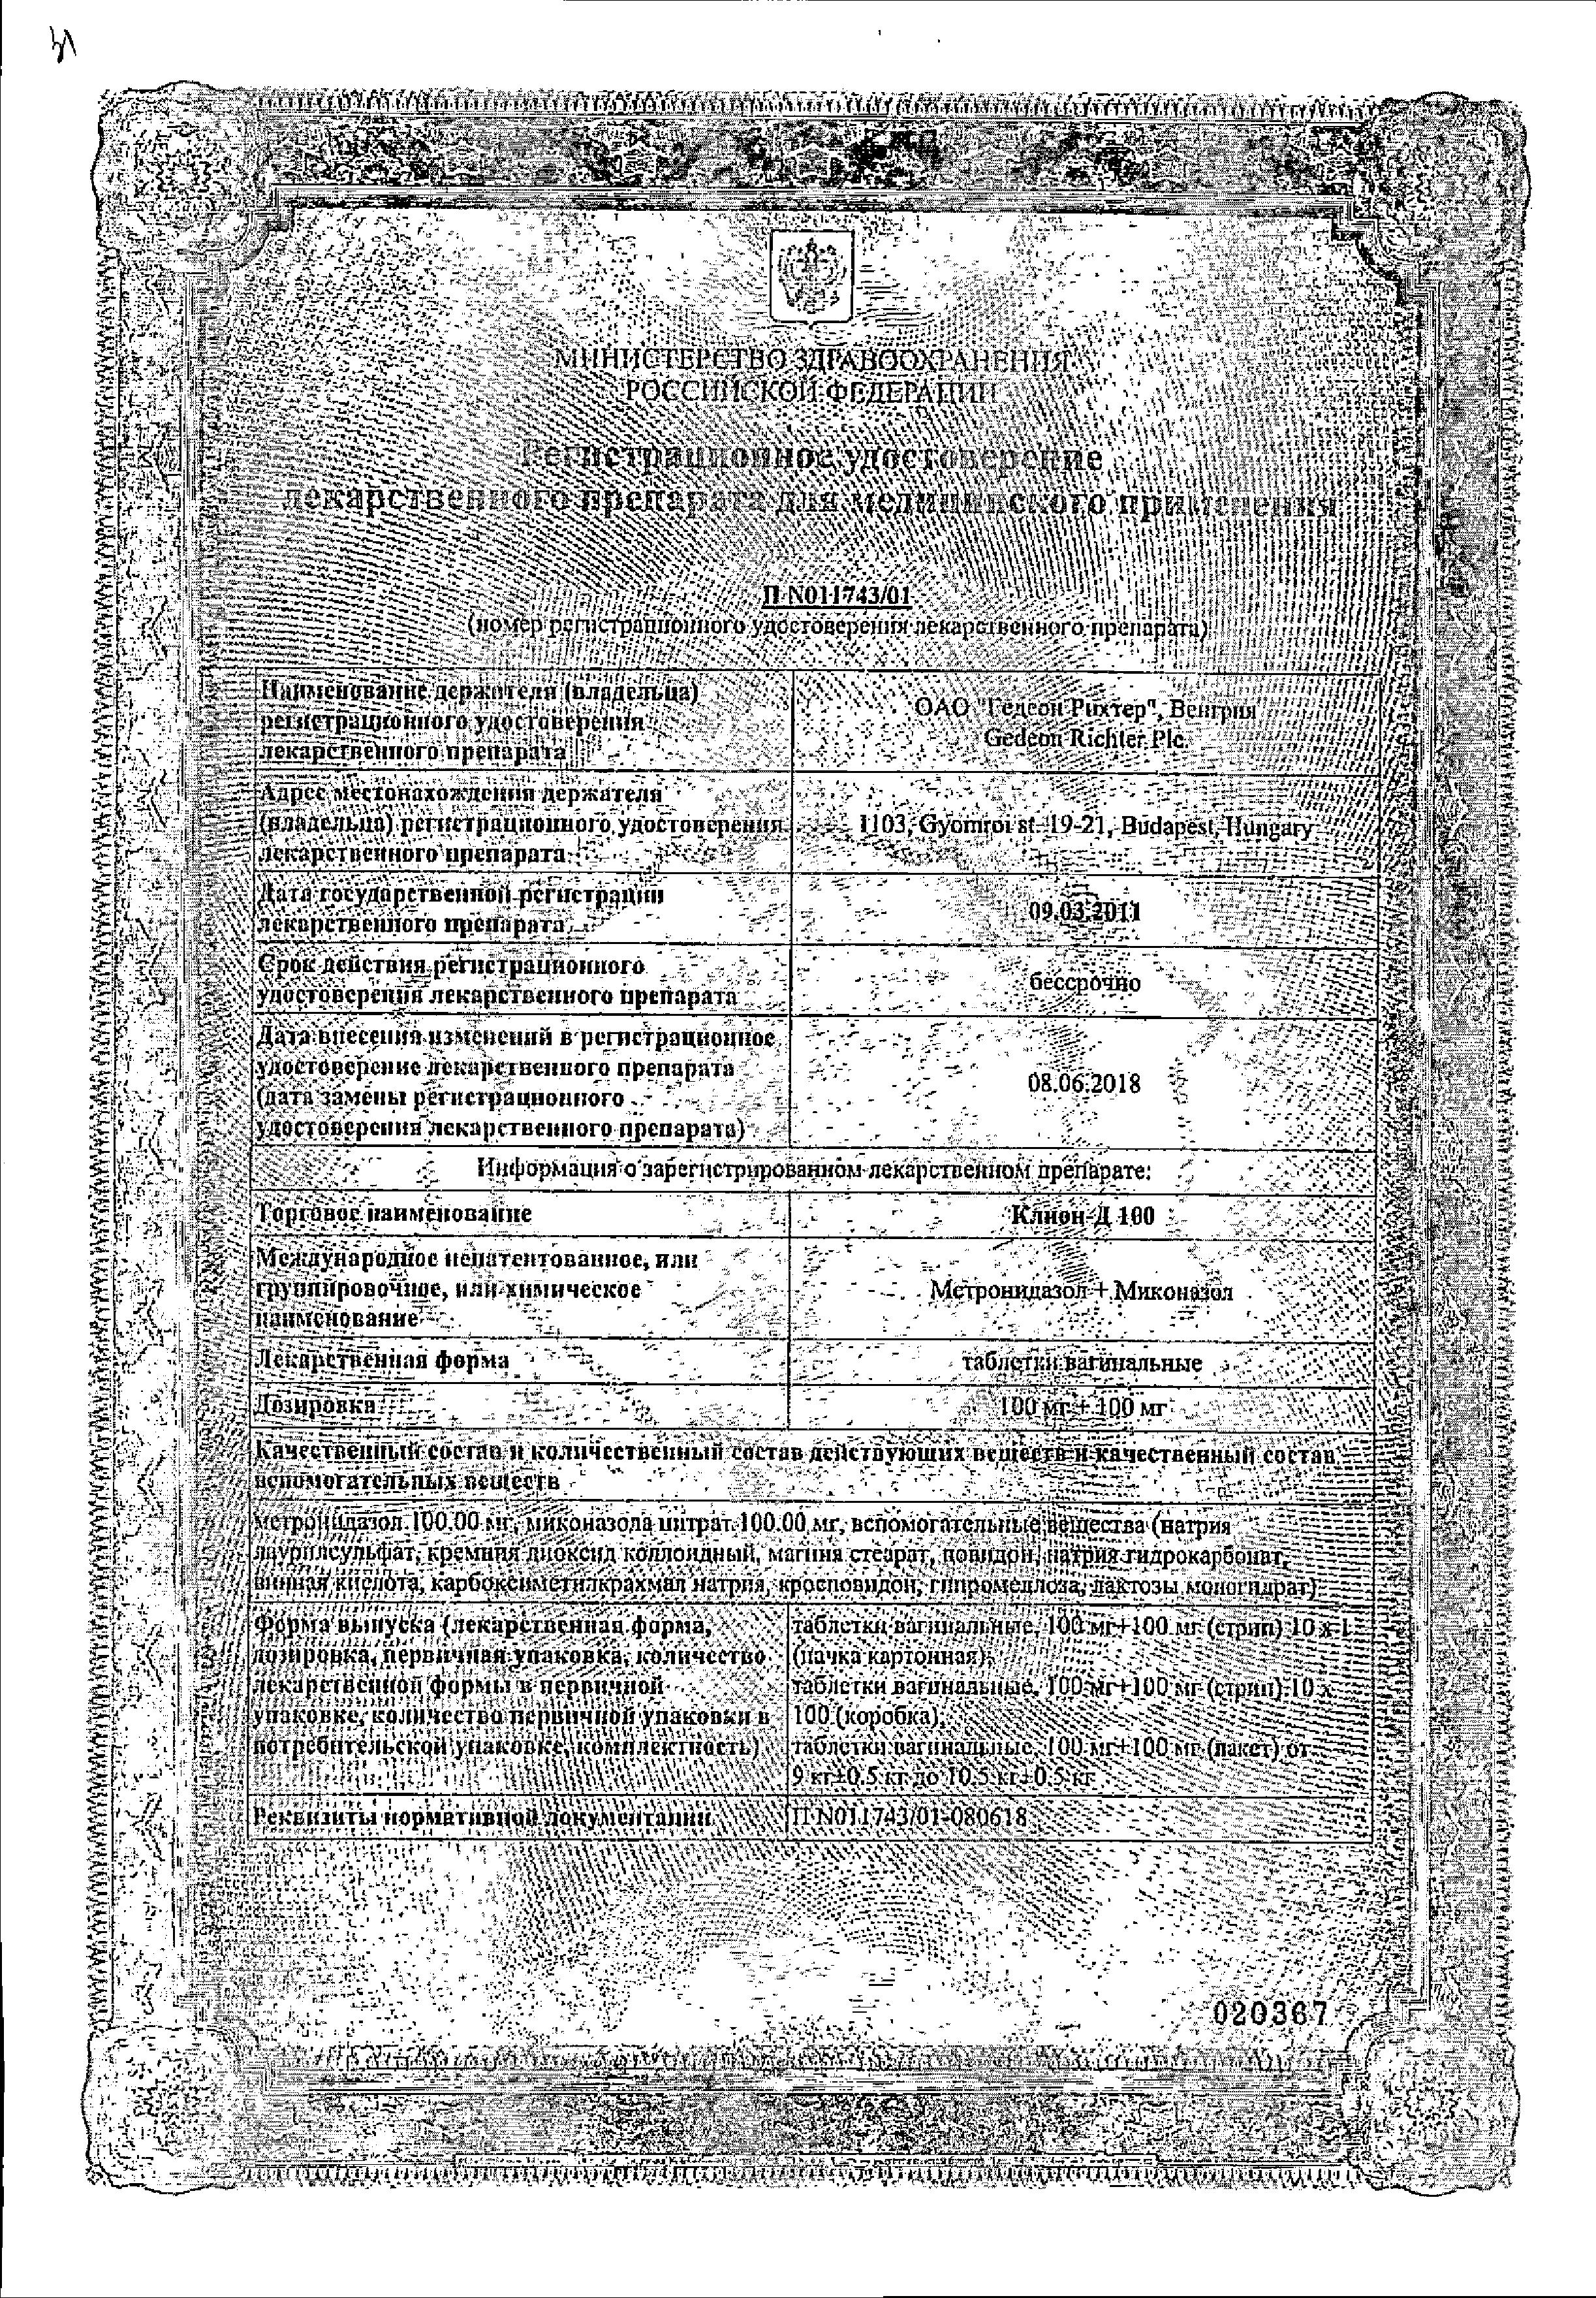 Клион-Д 100 сертификат